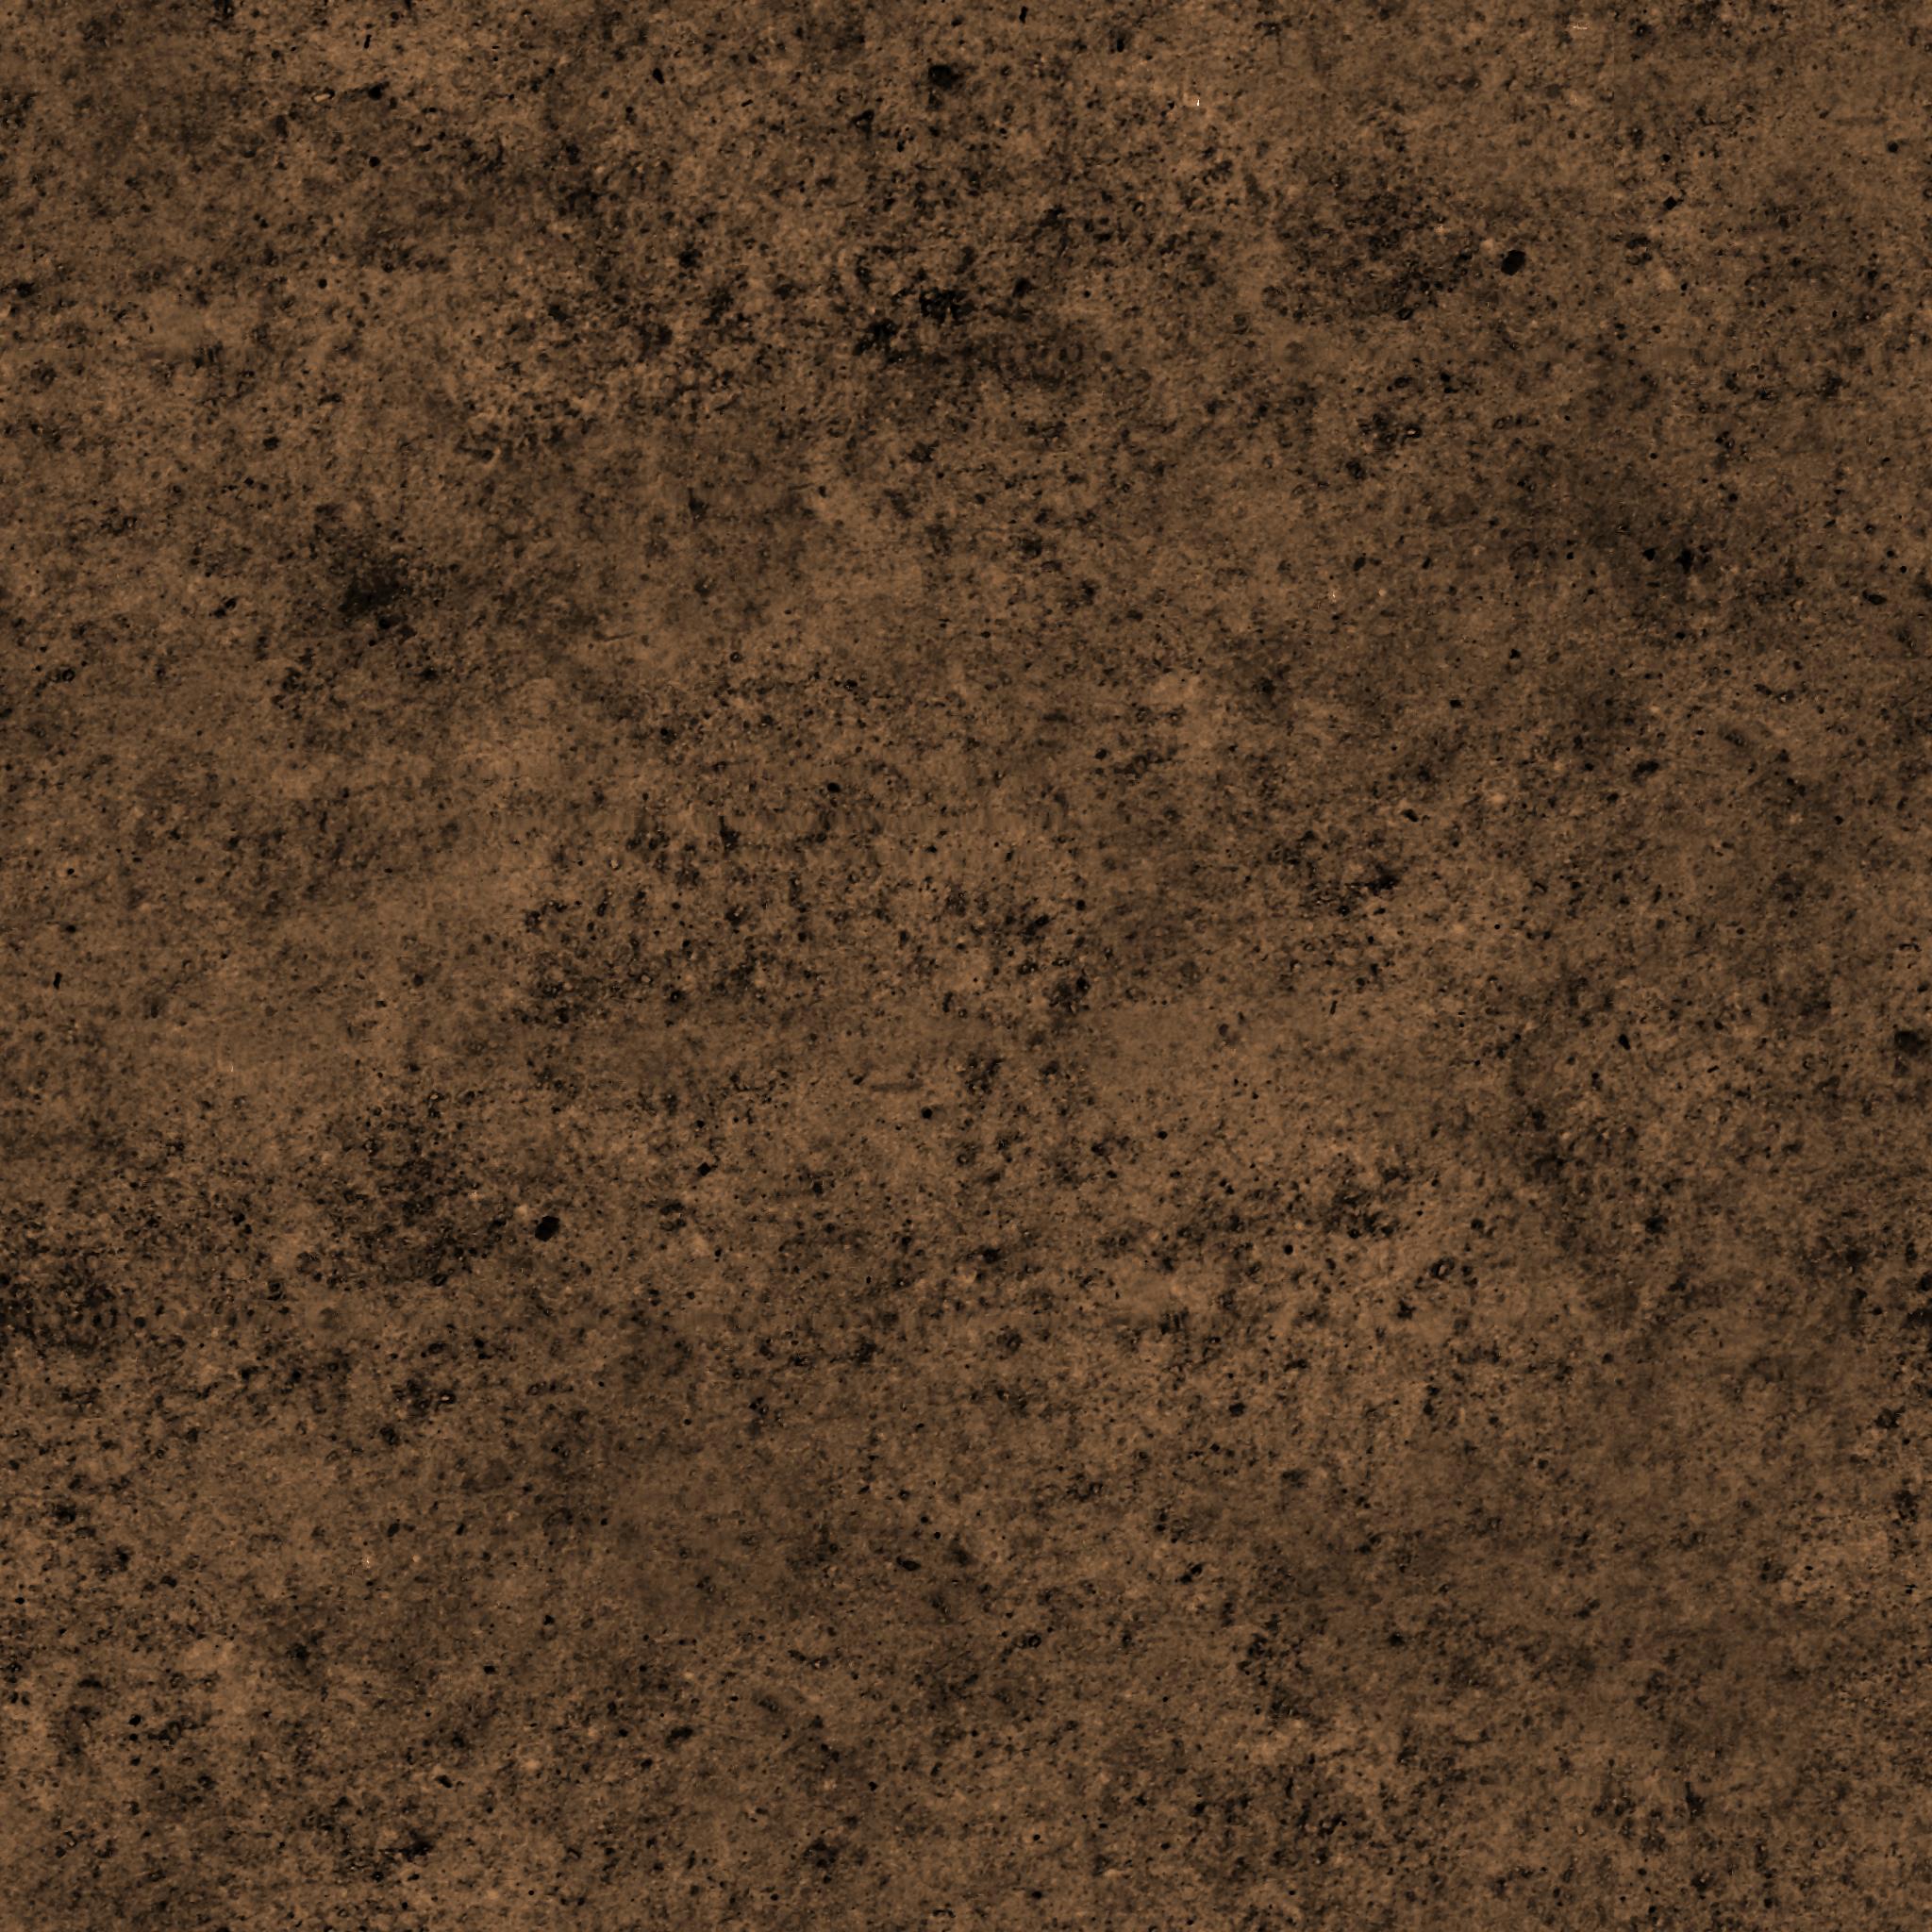 dirt texture game - photo #37